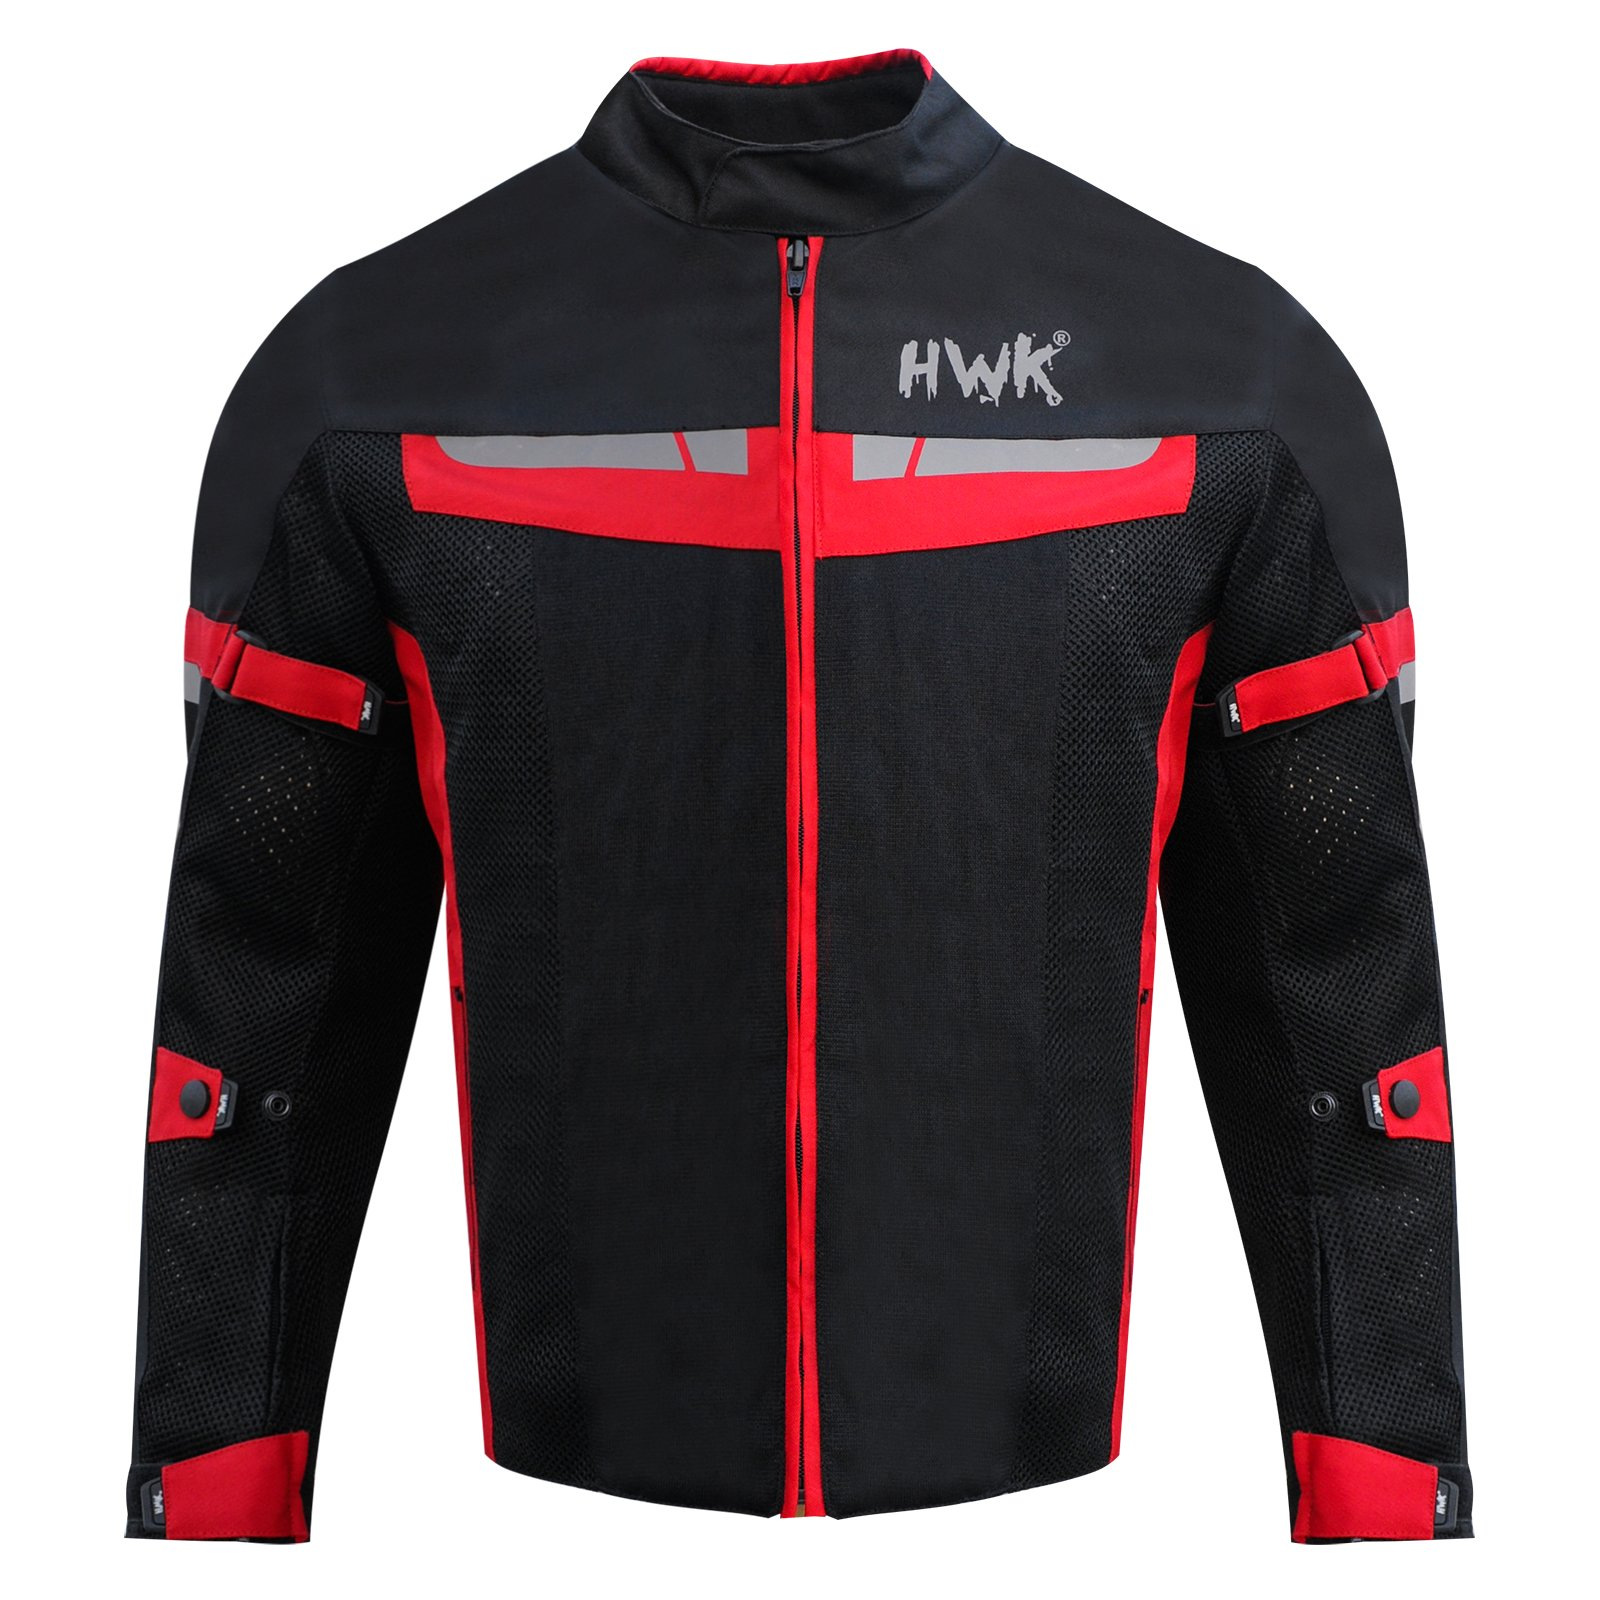 HWK Motorsports Direct Mesh Motorcycle Jacket Coat Motorbike Jacket Biker Cordura Waterproof CE Armoured Breathable 100% Waterproof Reissa Membrane 1 YEAR WARRANTY!! (X-Large, Black)